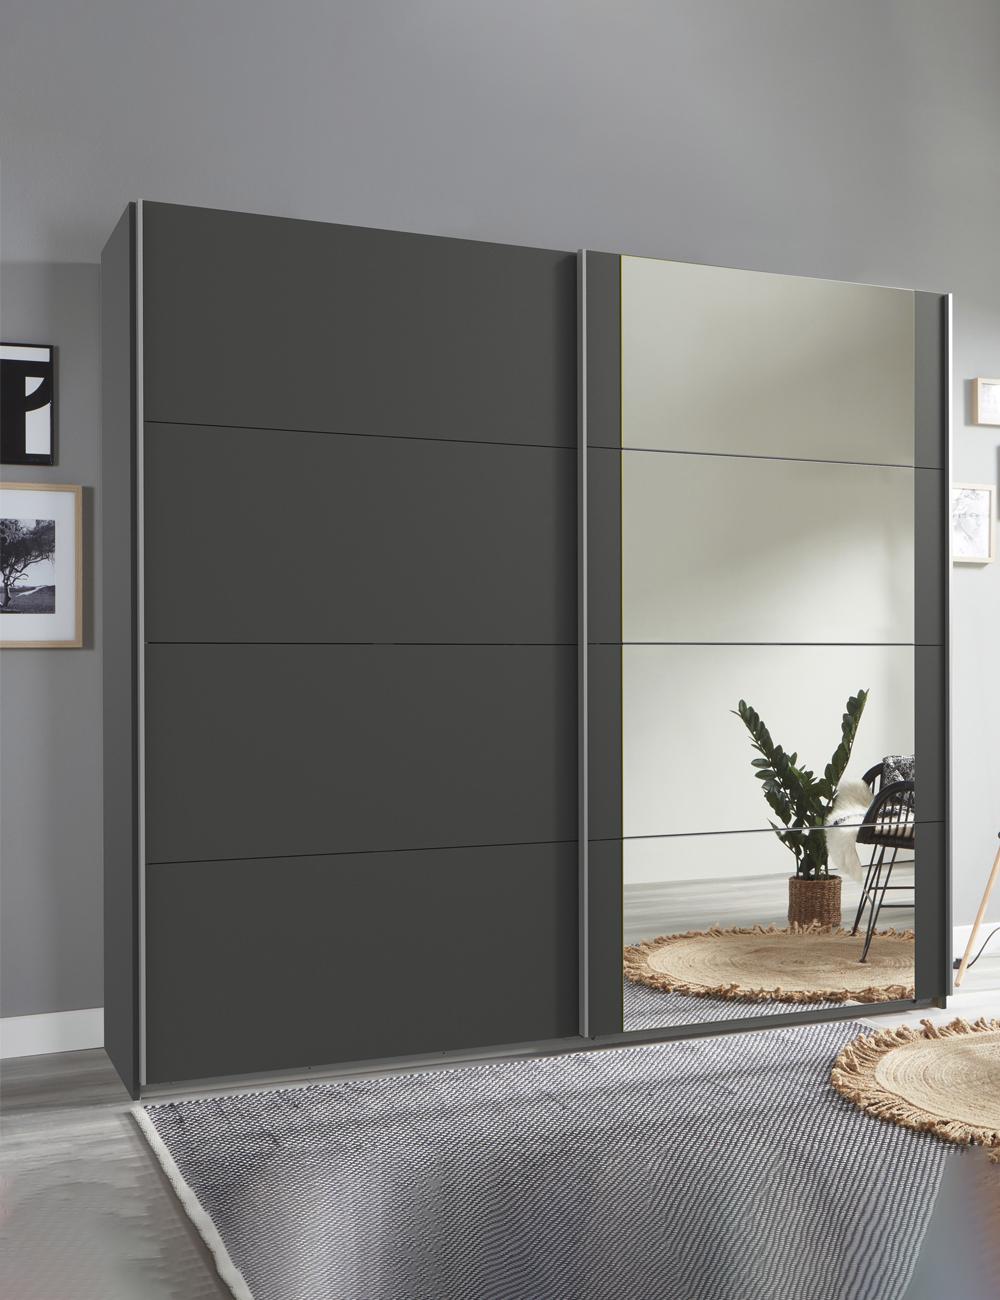 Teppich «Lounge», 160 x 230 cm, grau